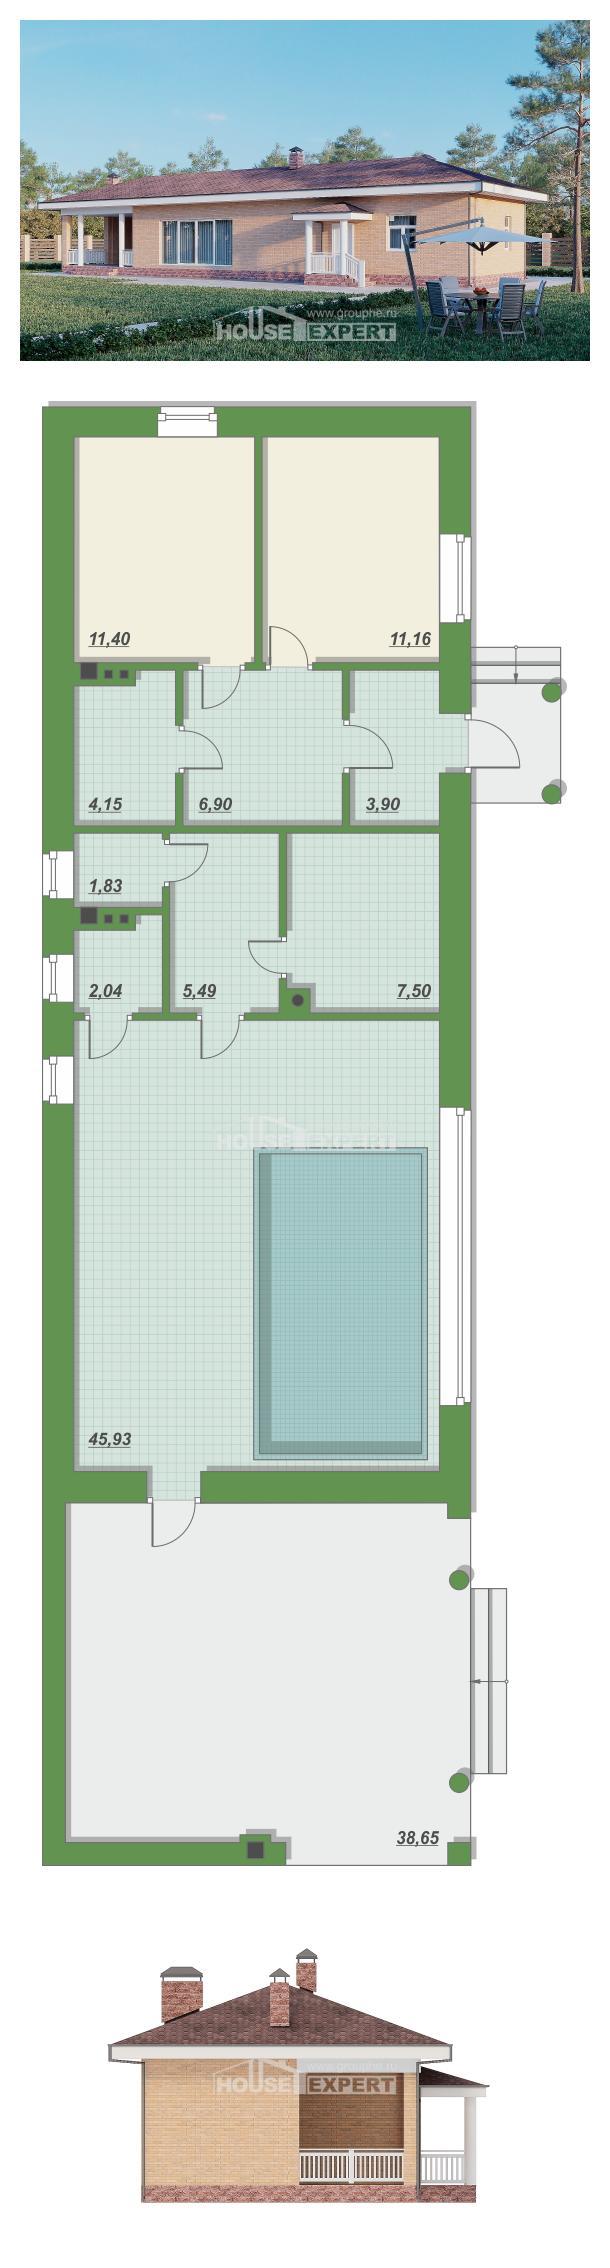 Проект дома 110-006-Л   House Expert